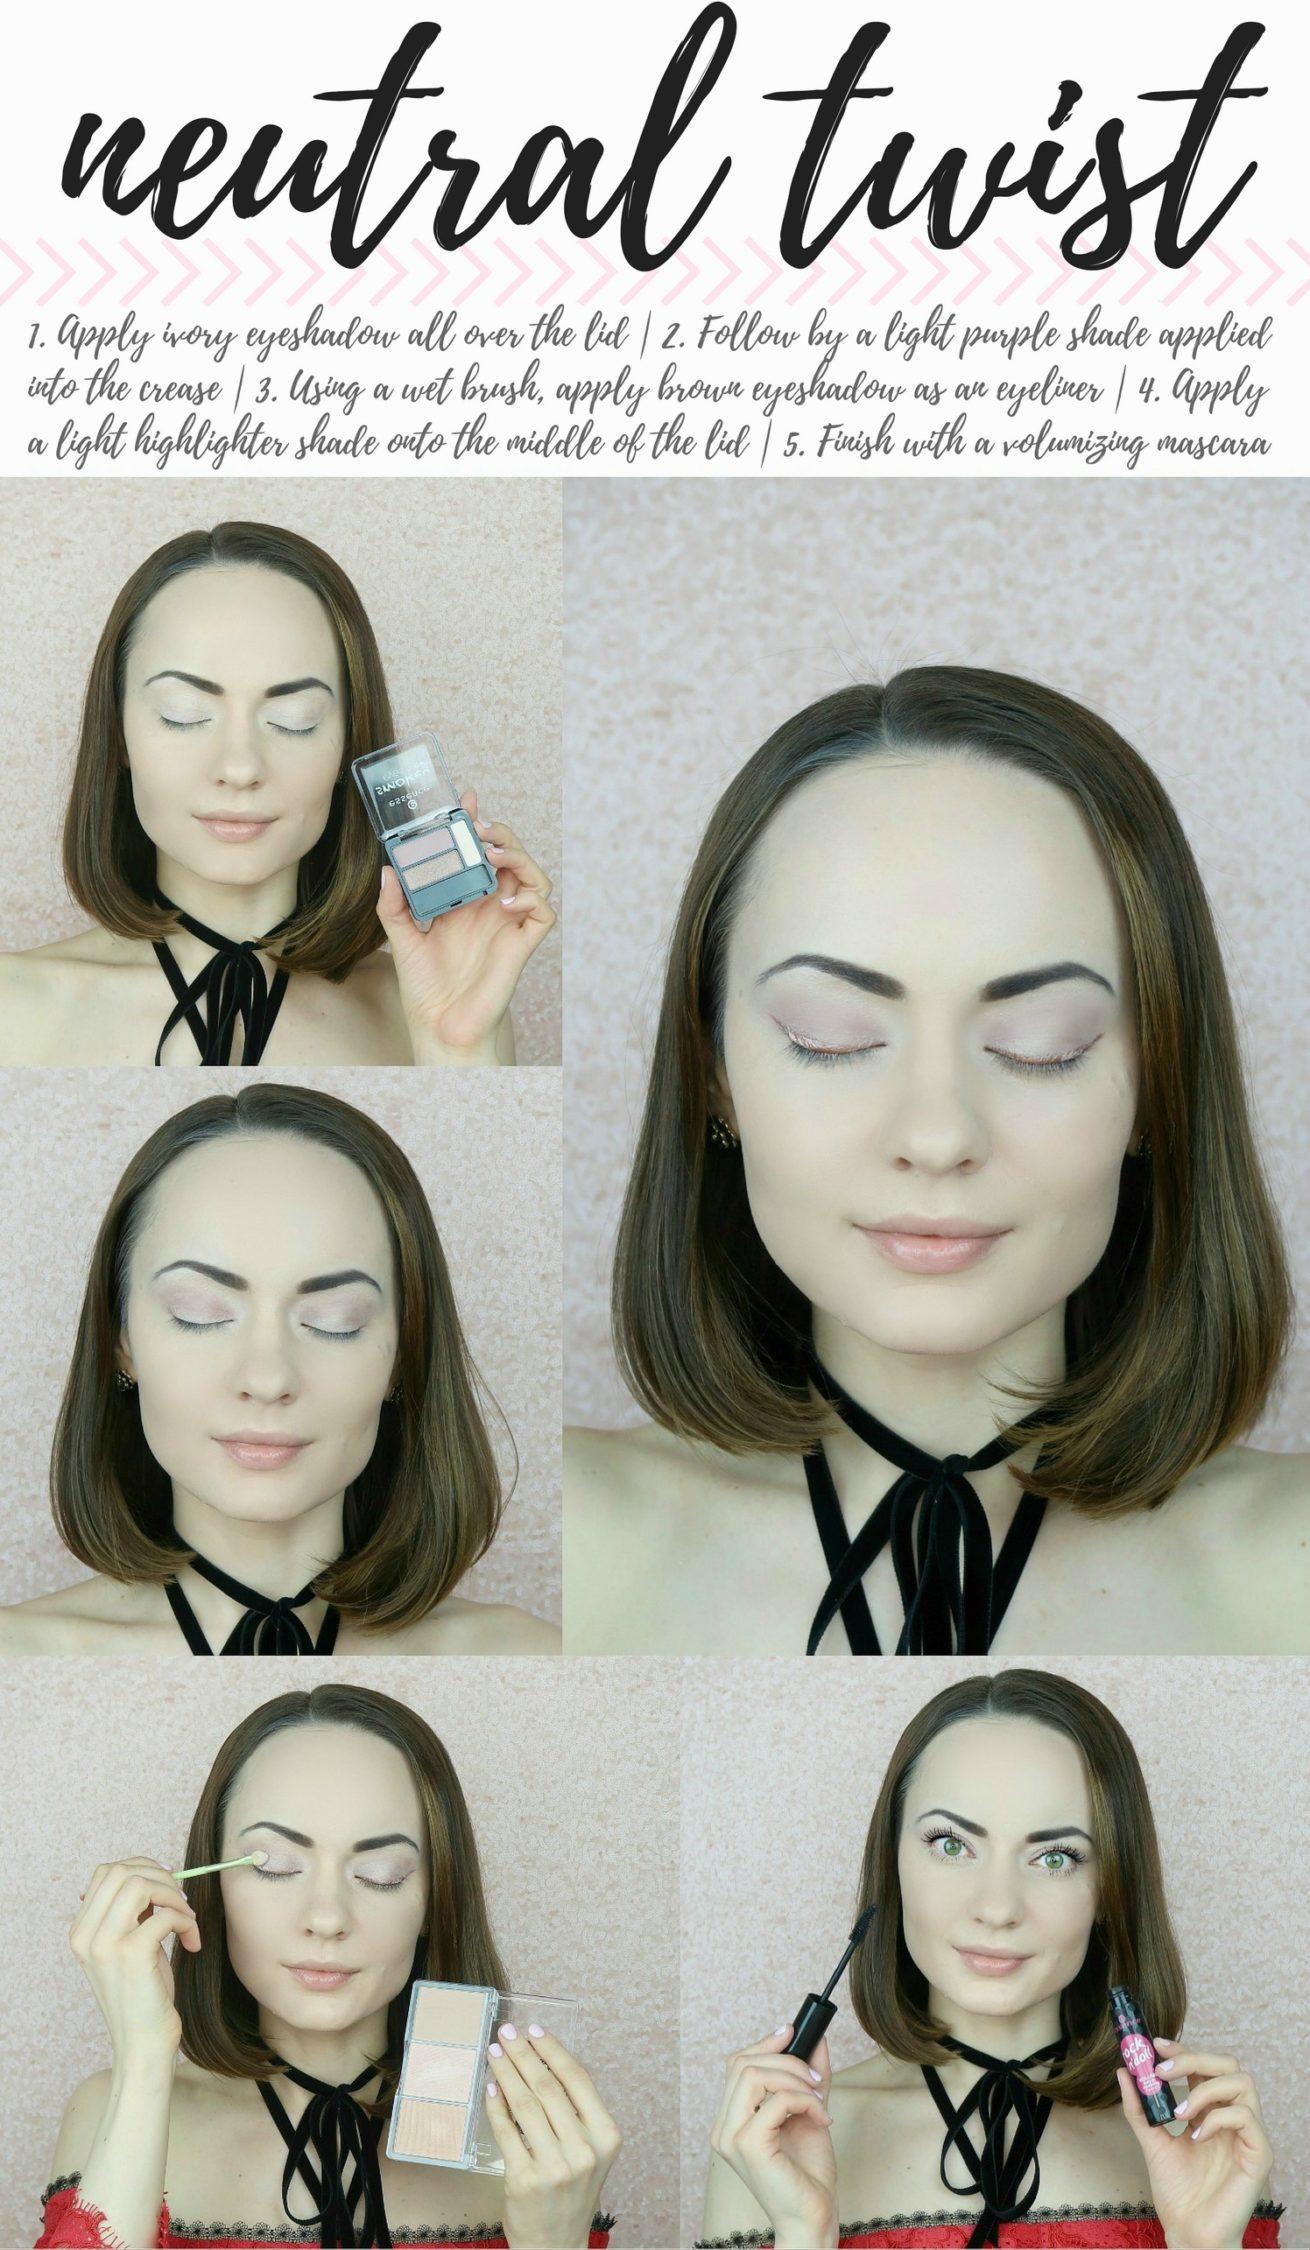 essence cosmetics tutorial - neutral twist look by StyleSprinter